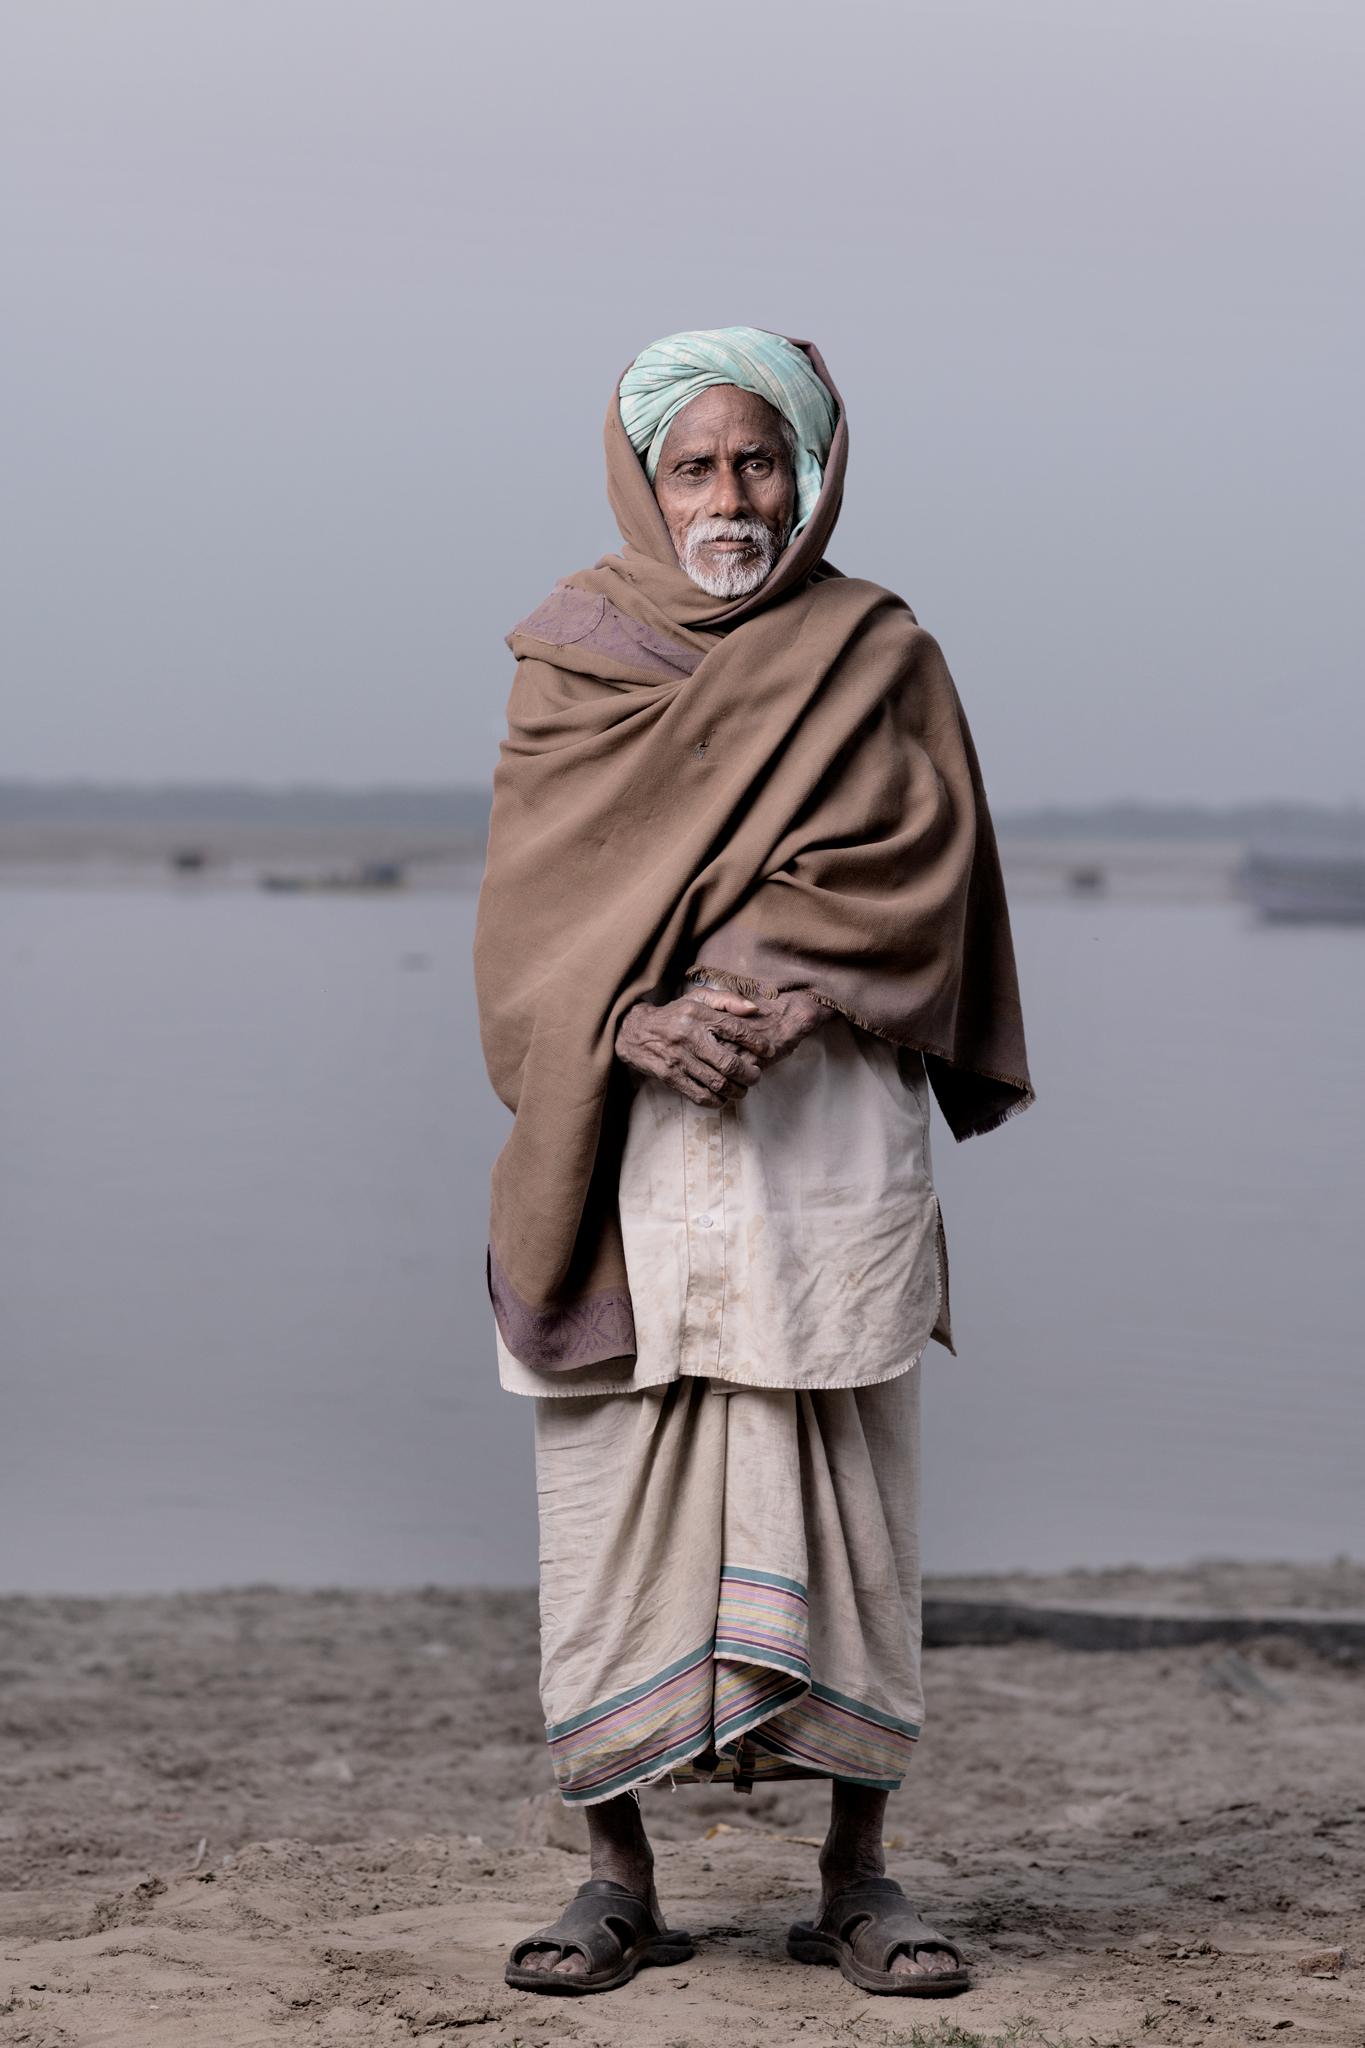 Varanasi_portrait_travel_photography_Manchester_Adventure_Photographer_Jan_Bella31.jpg